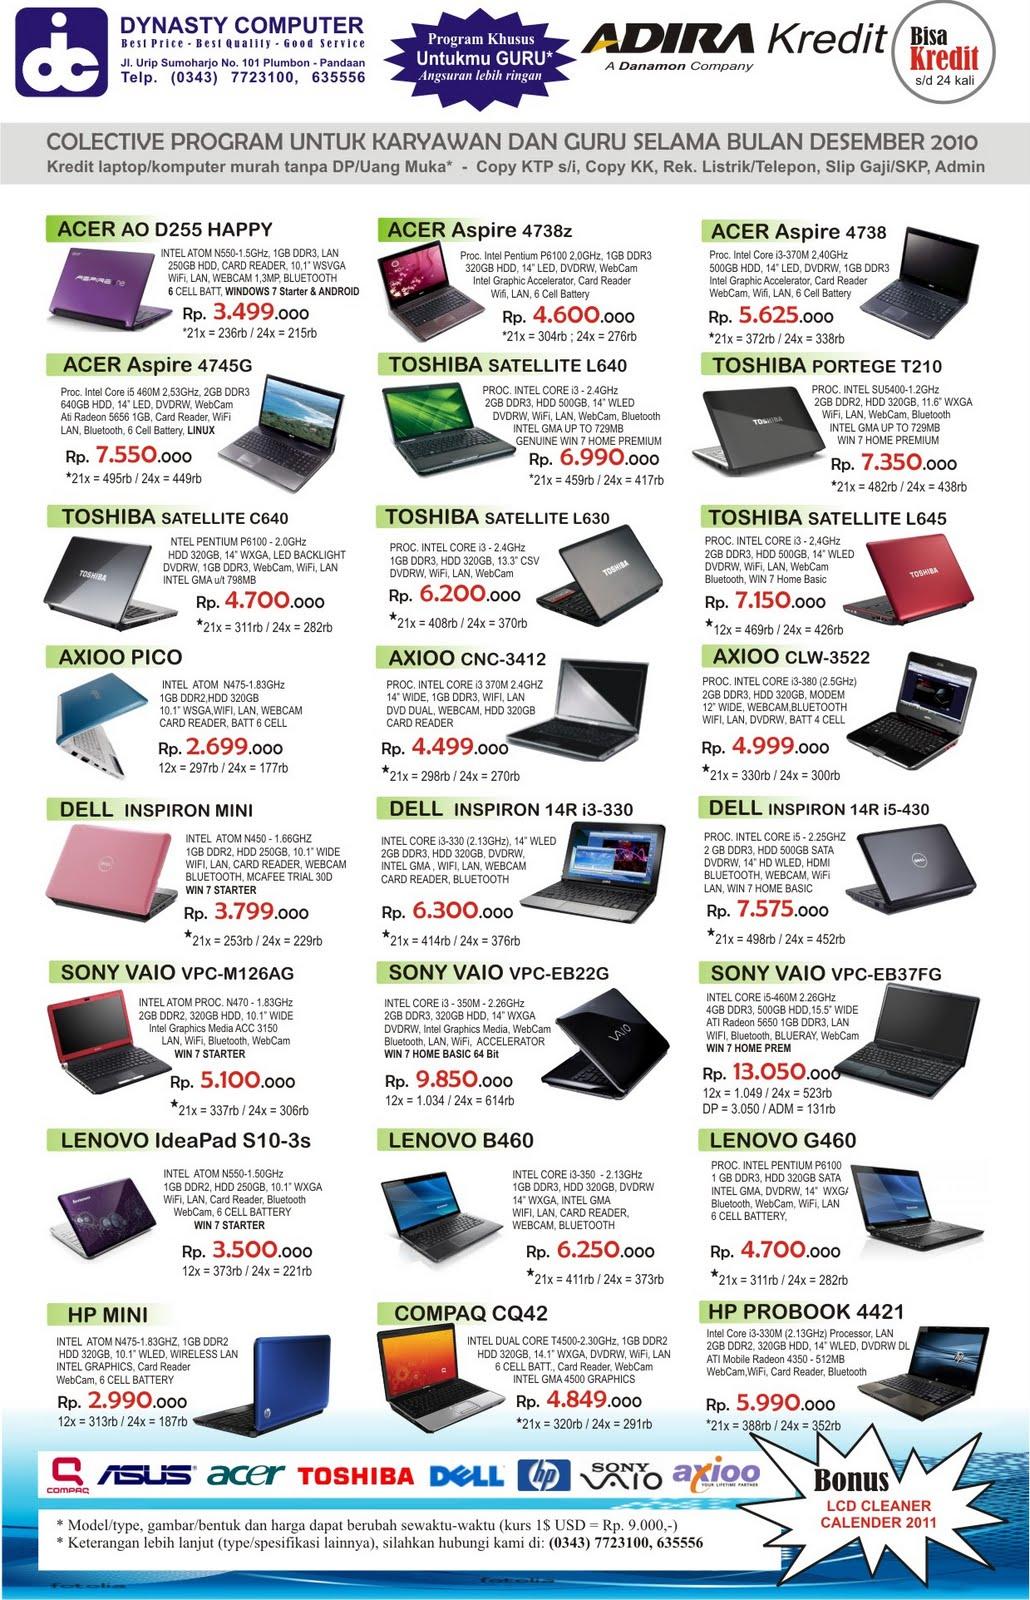 Dynasty Computer Indonesia Nb Laptop Bagimu Guru